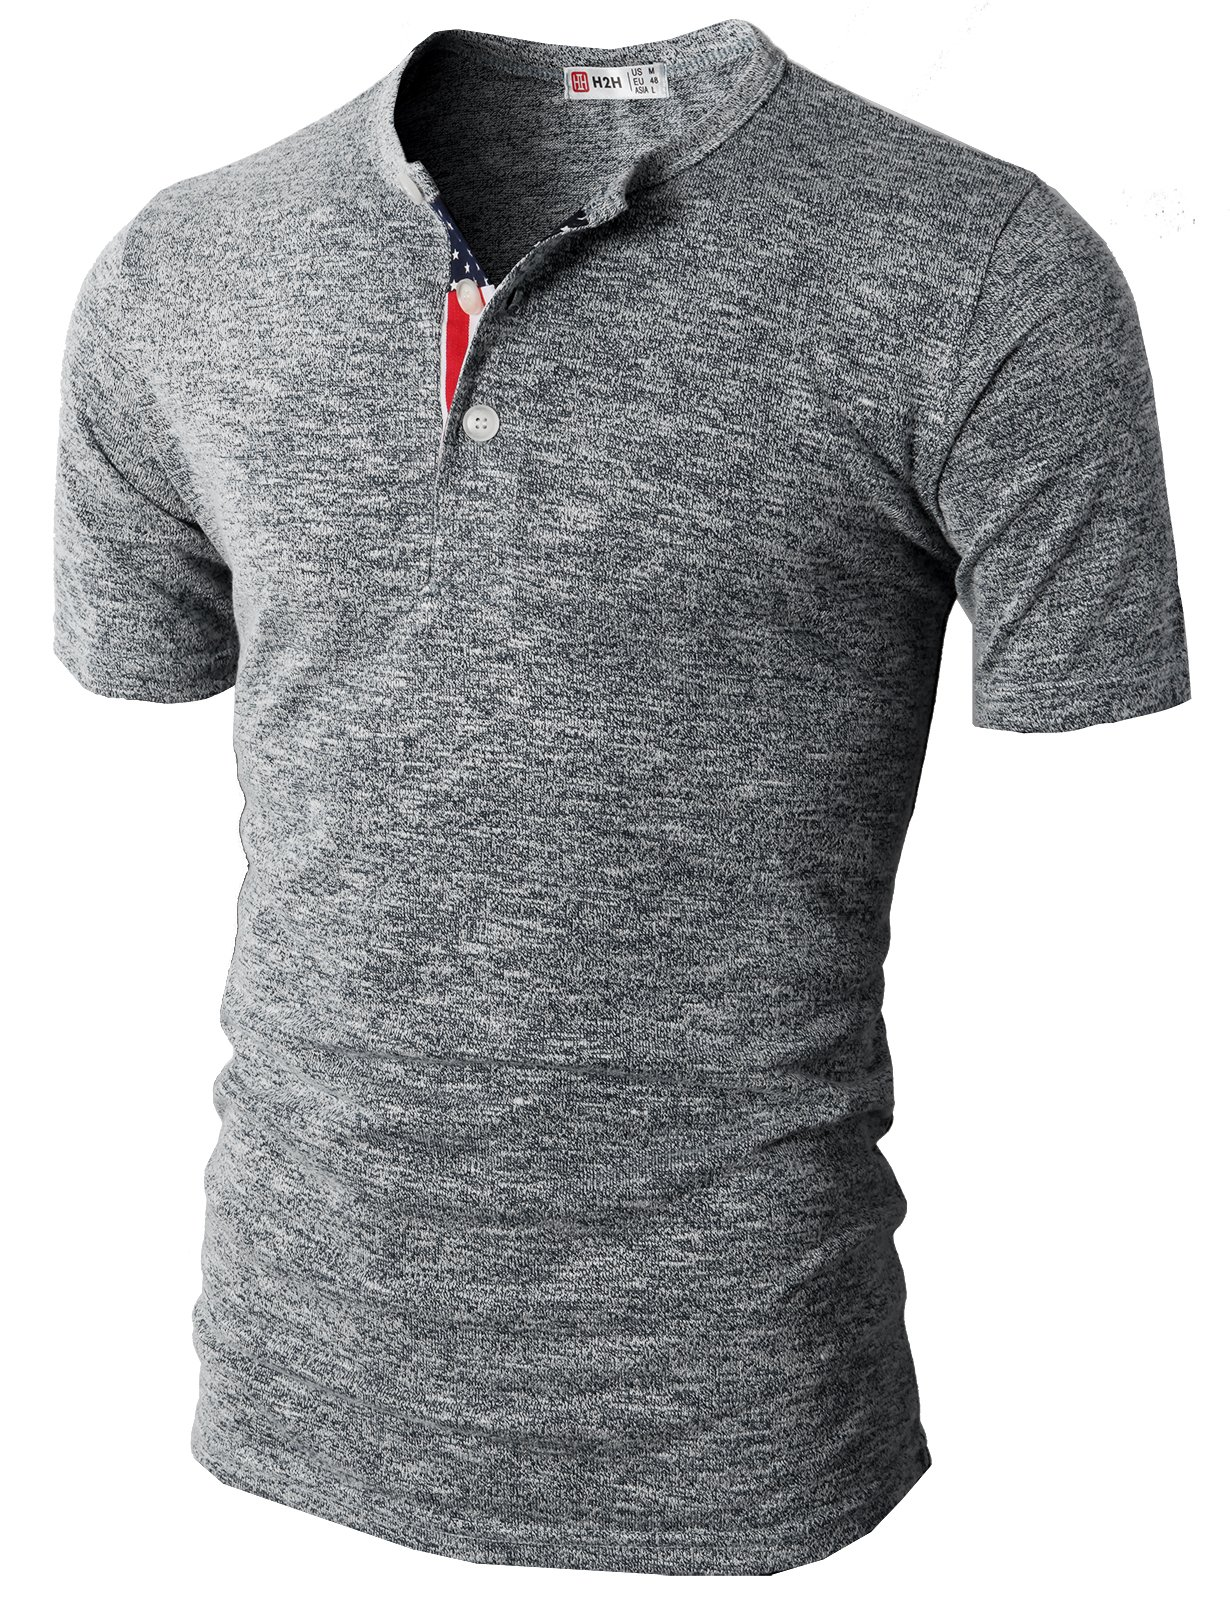 H2H Mens Fashion Flag Henley Short Sleeve Summer T-Shirt Gray US M/Asia L (CMTTS0172)